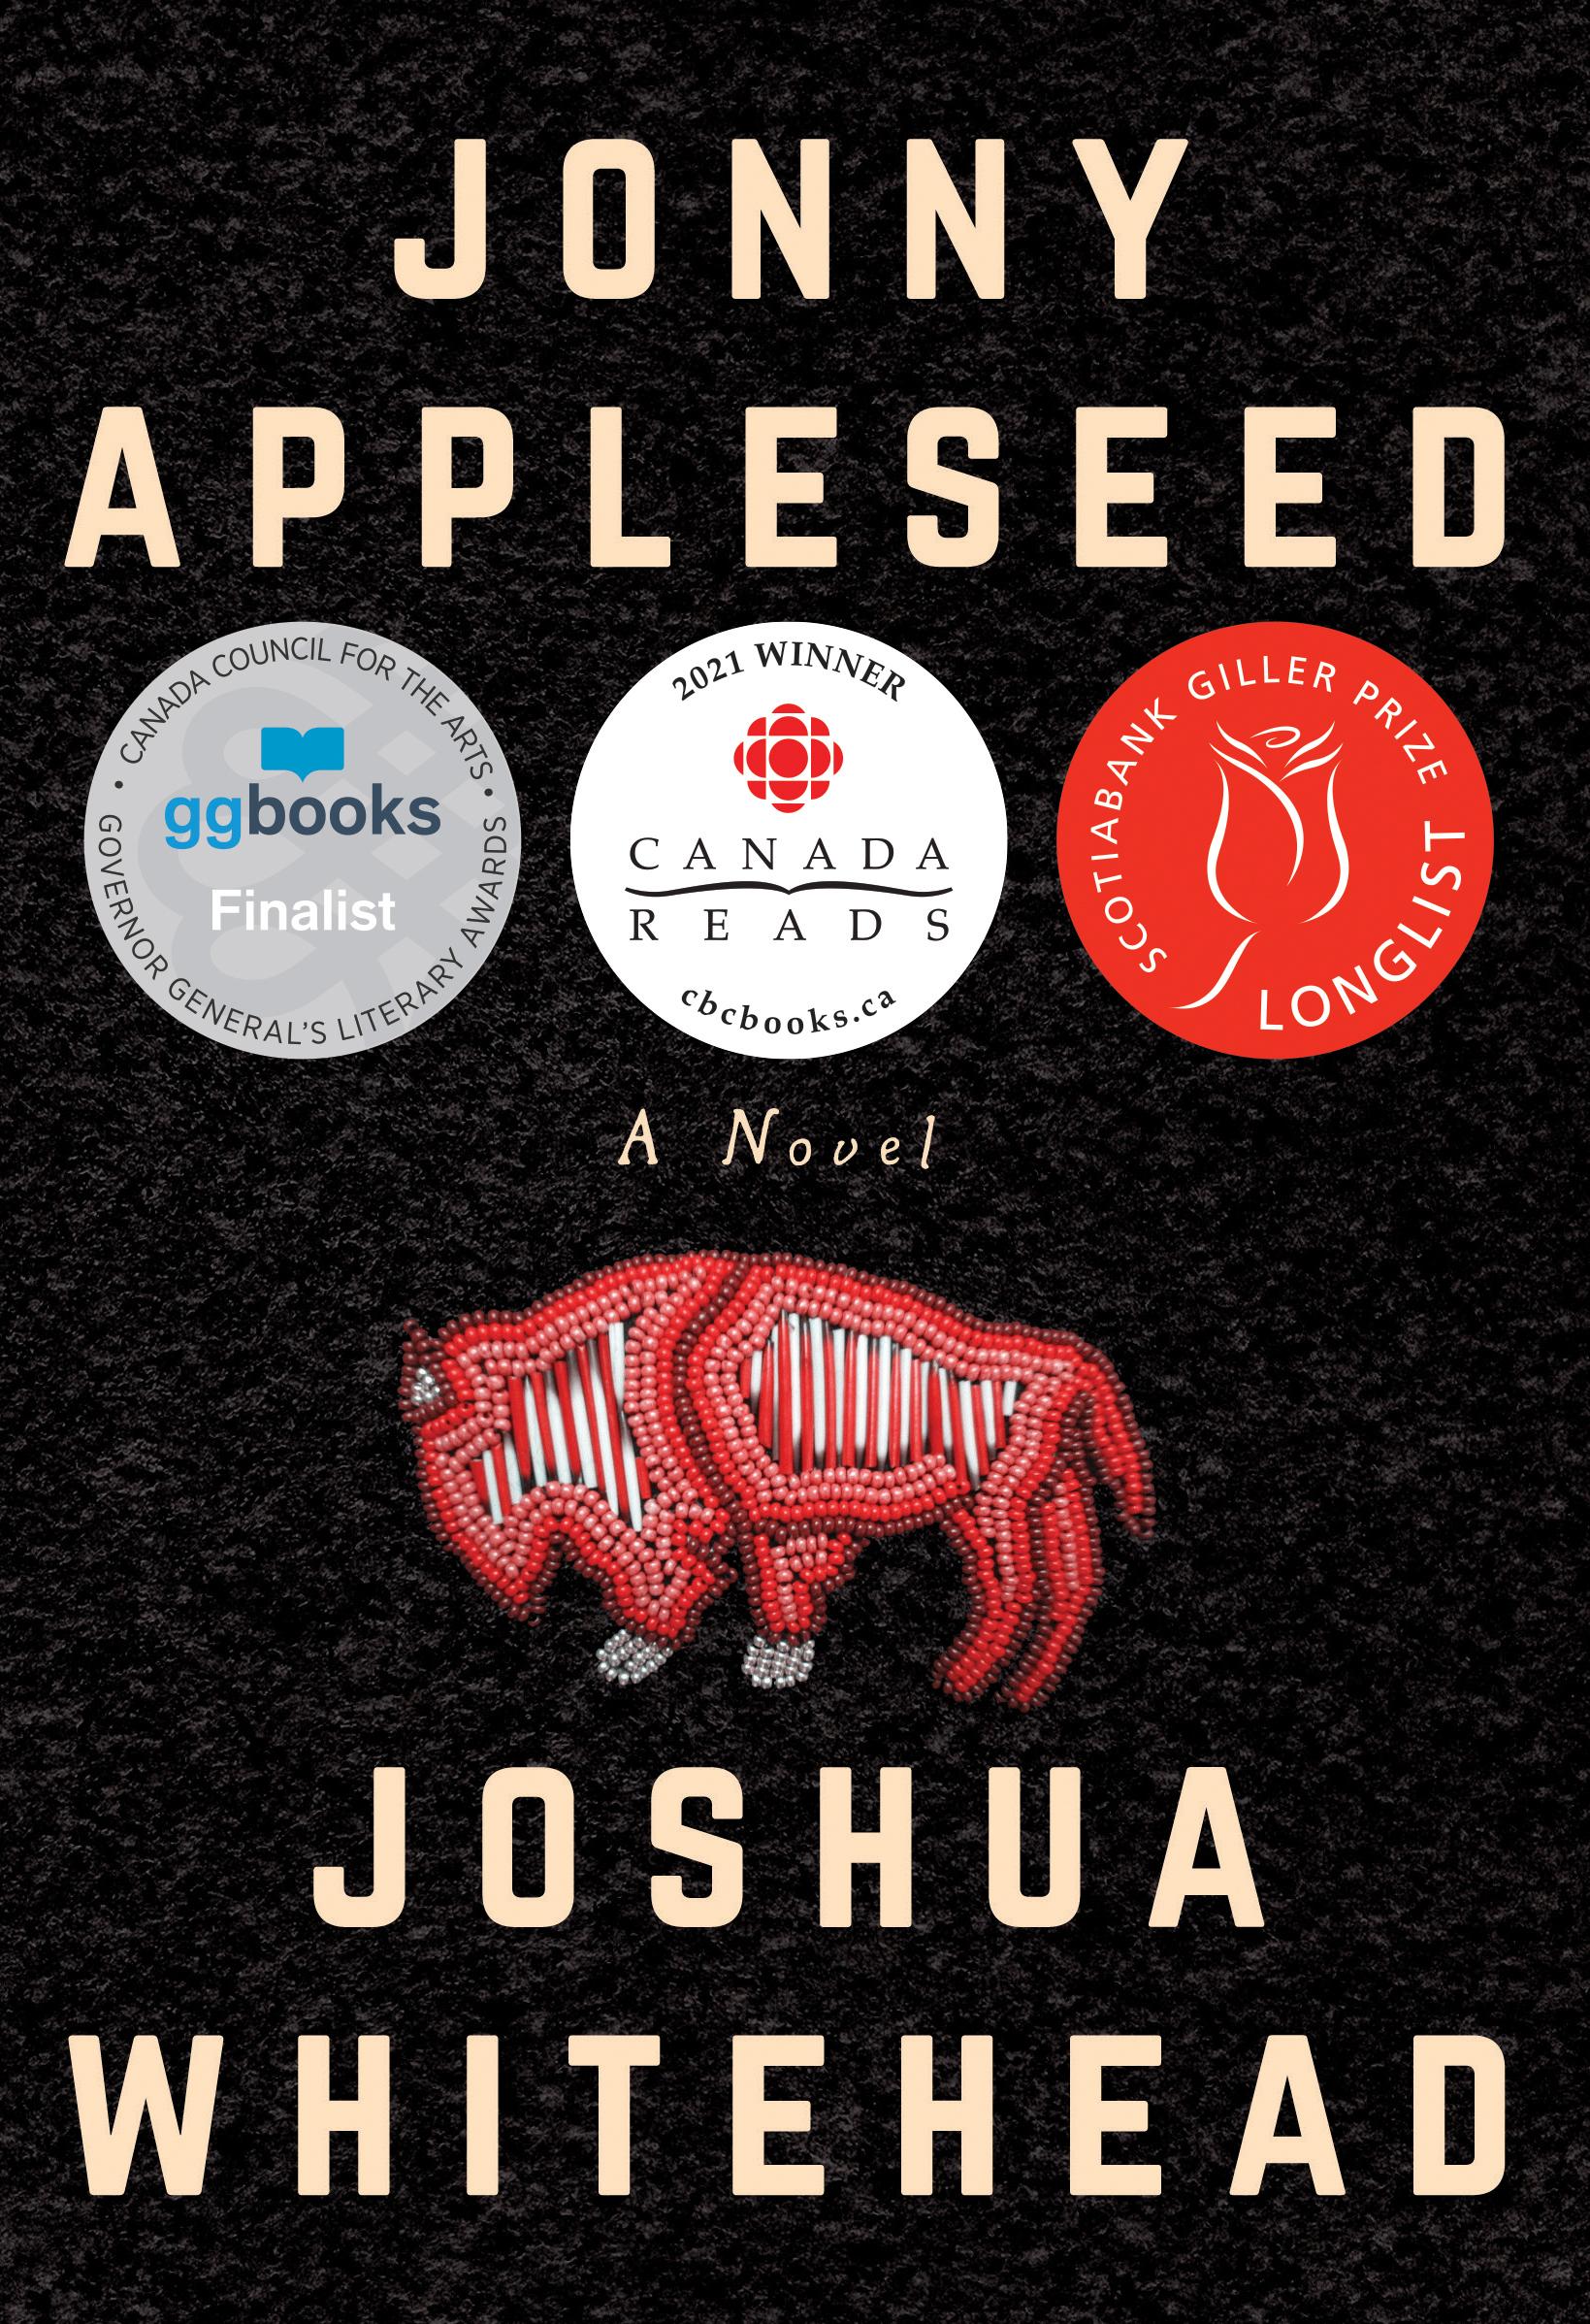 Book Jonny Appleseed by Joshua Whitehead